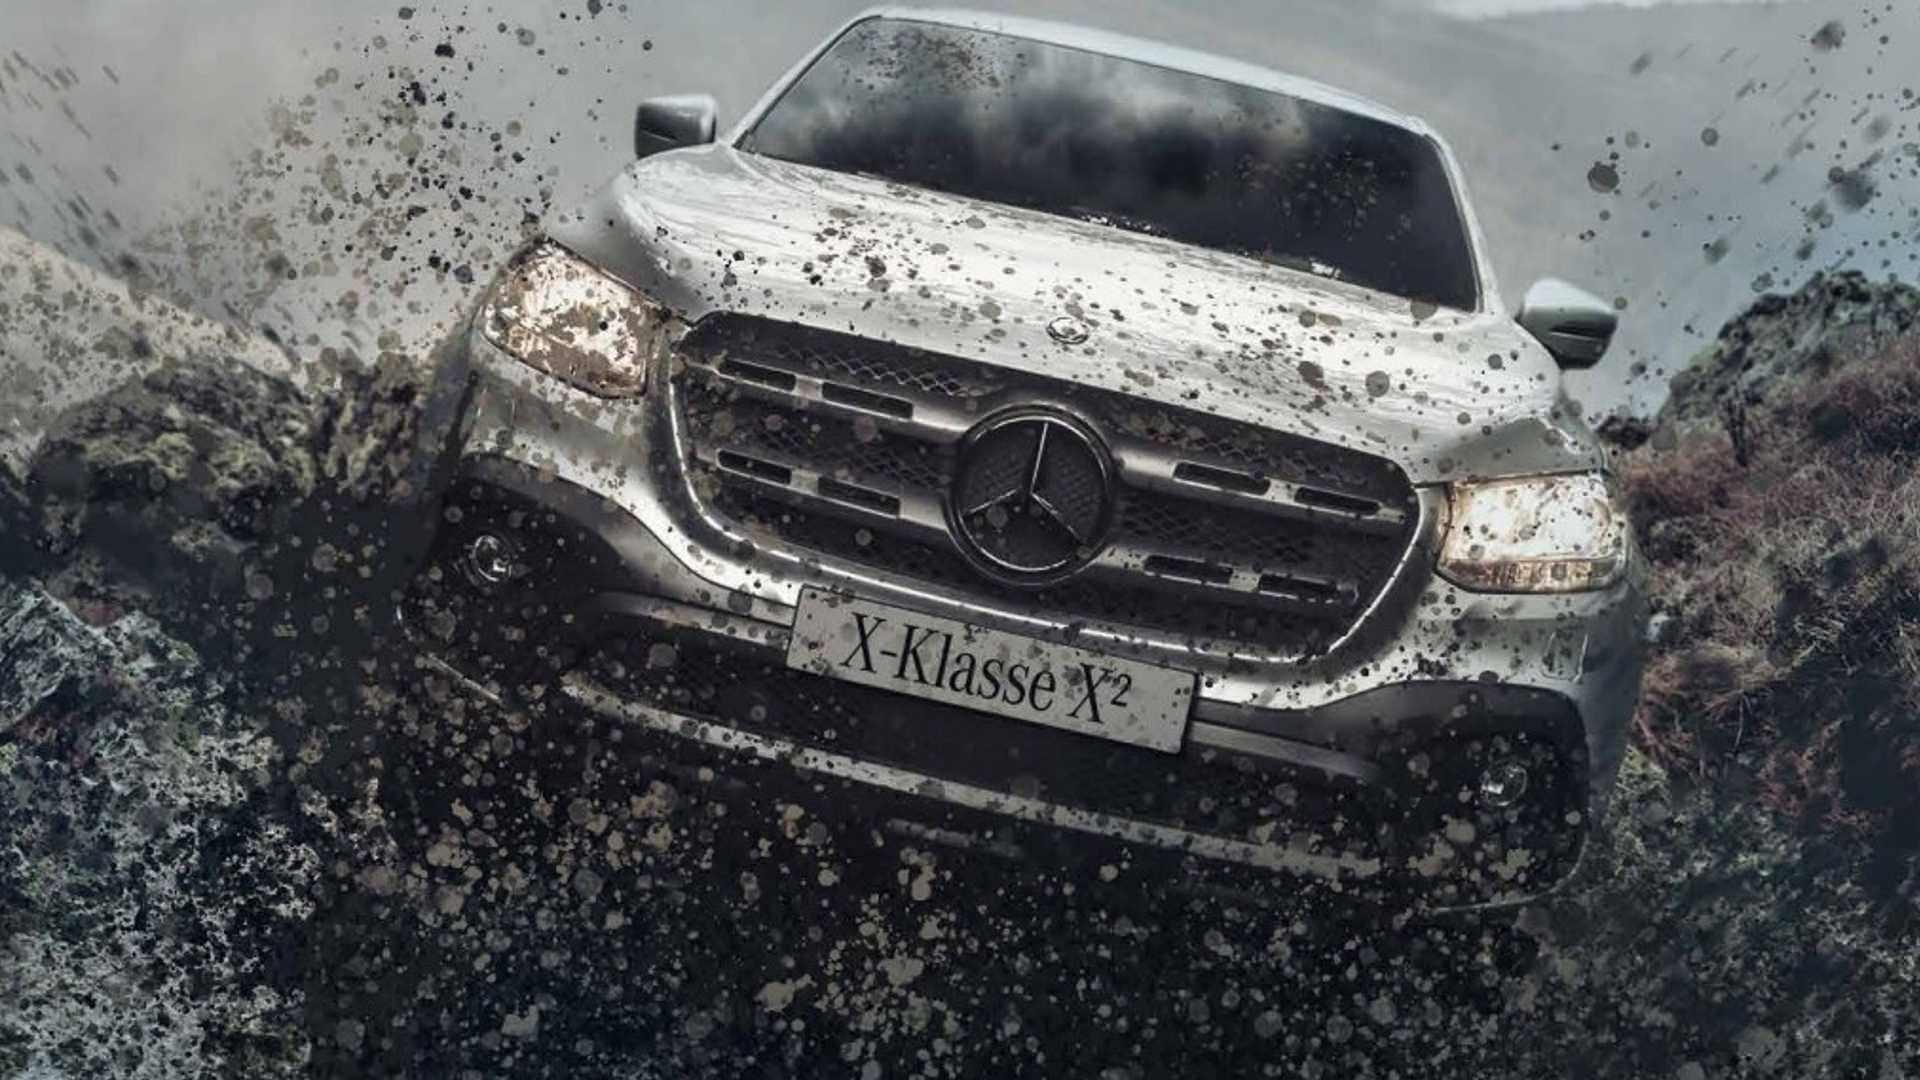 Пикап Mercedes X-Class X² для серьезного бездорожья | фото